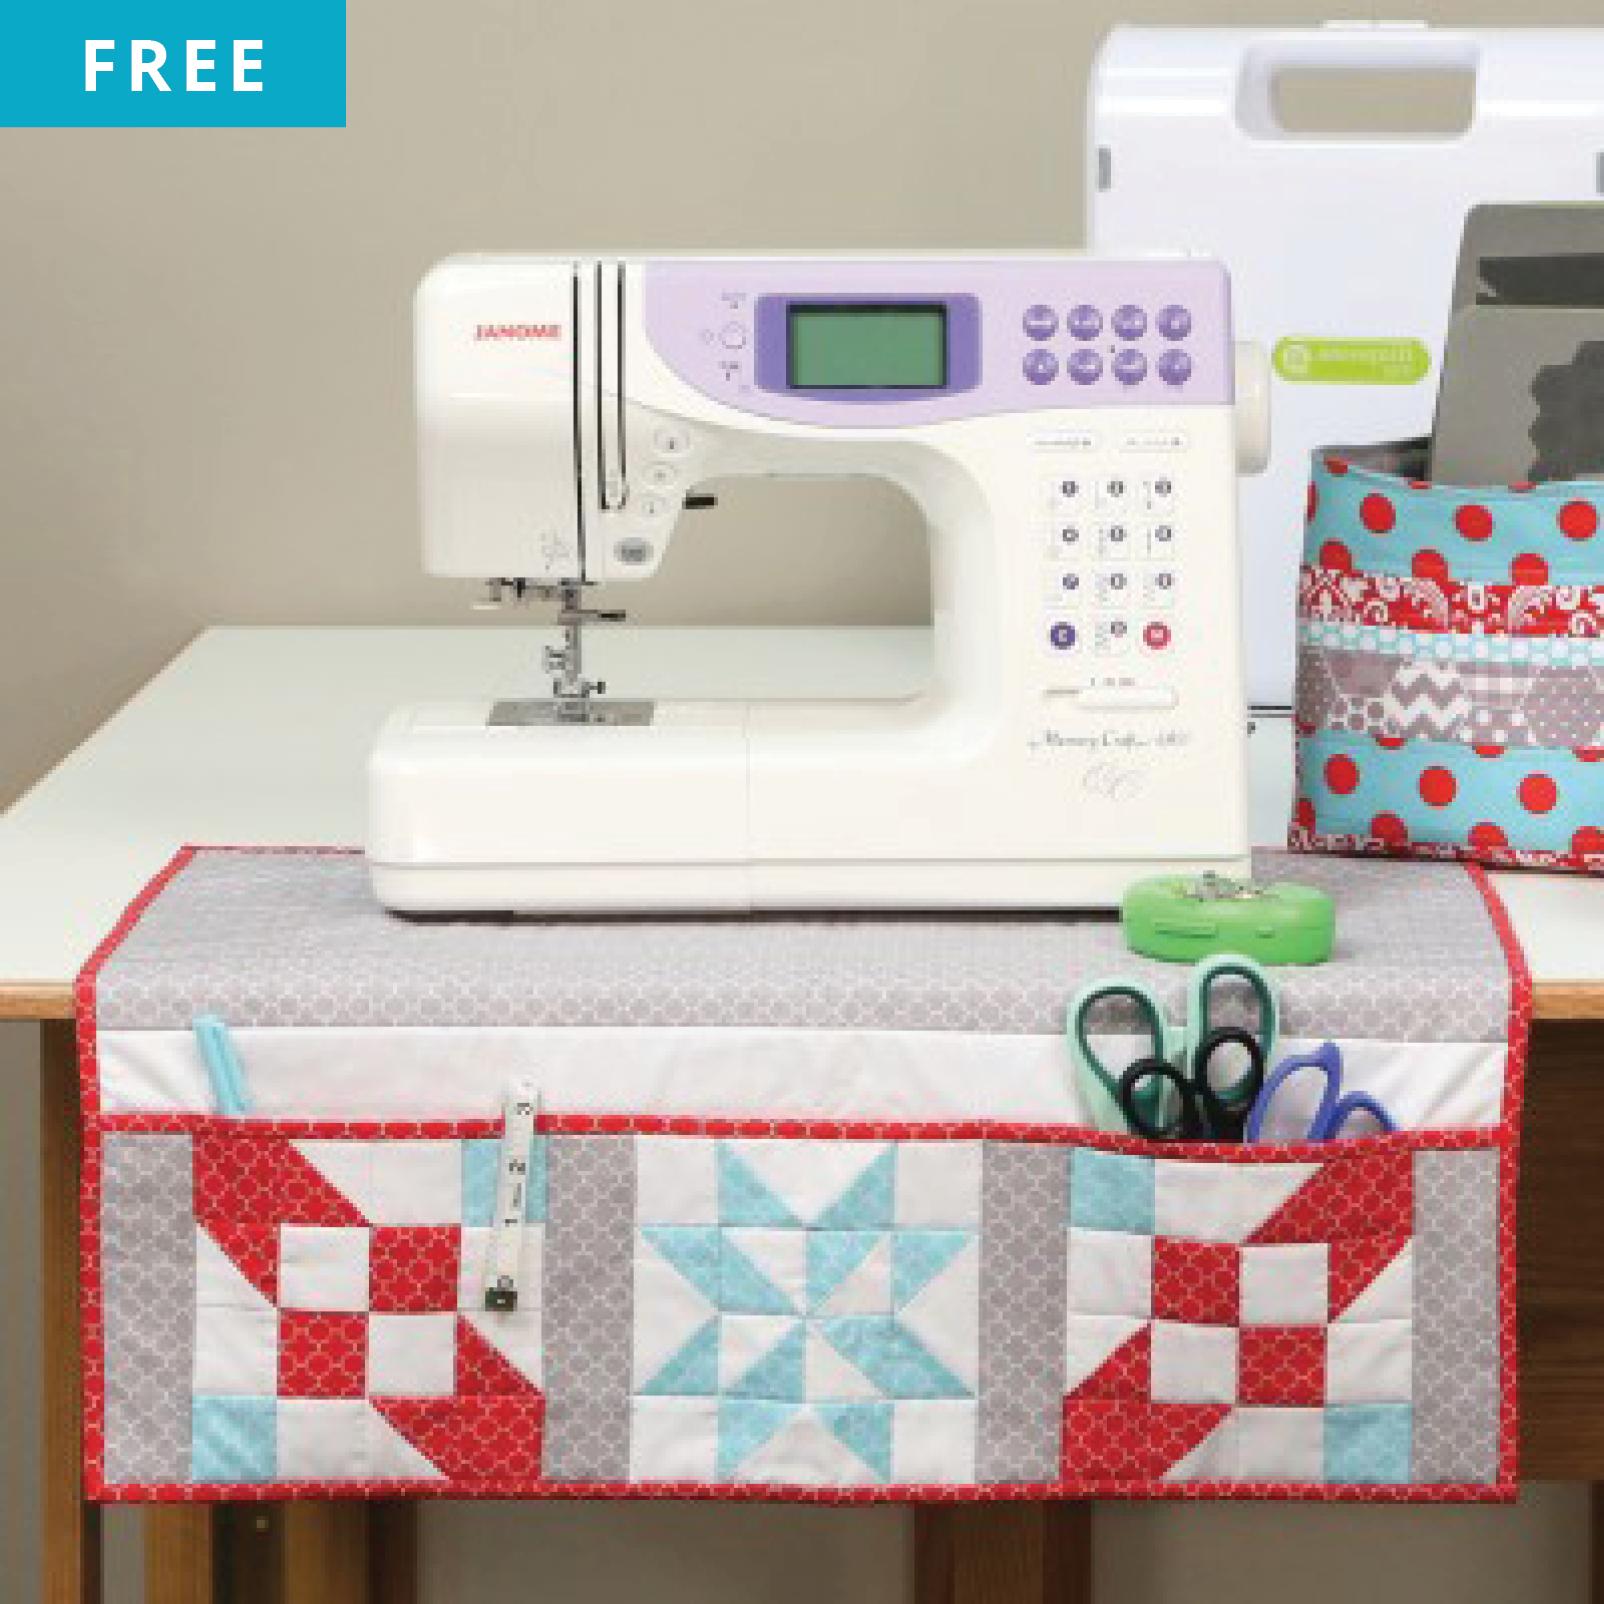 Free Quilt Pattern - Sewing Machine Organizing Mat